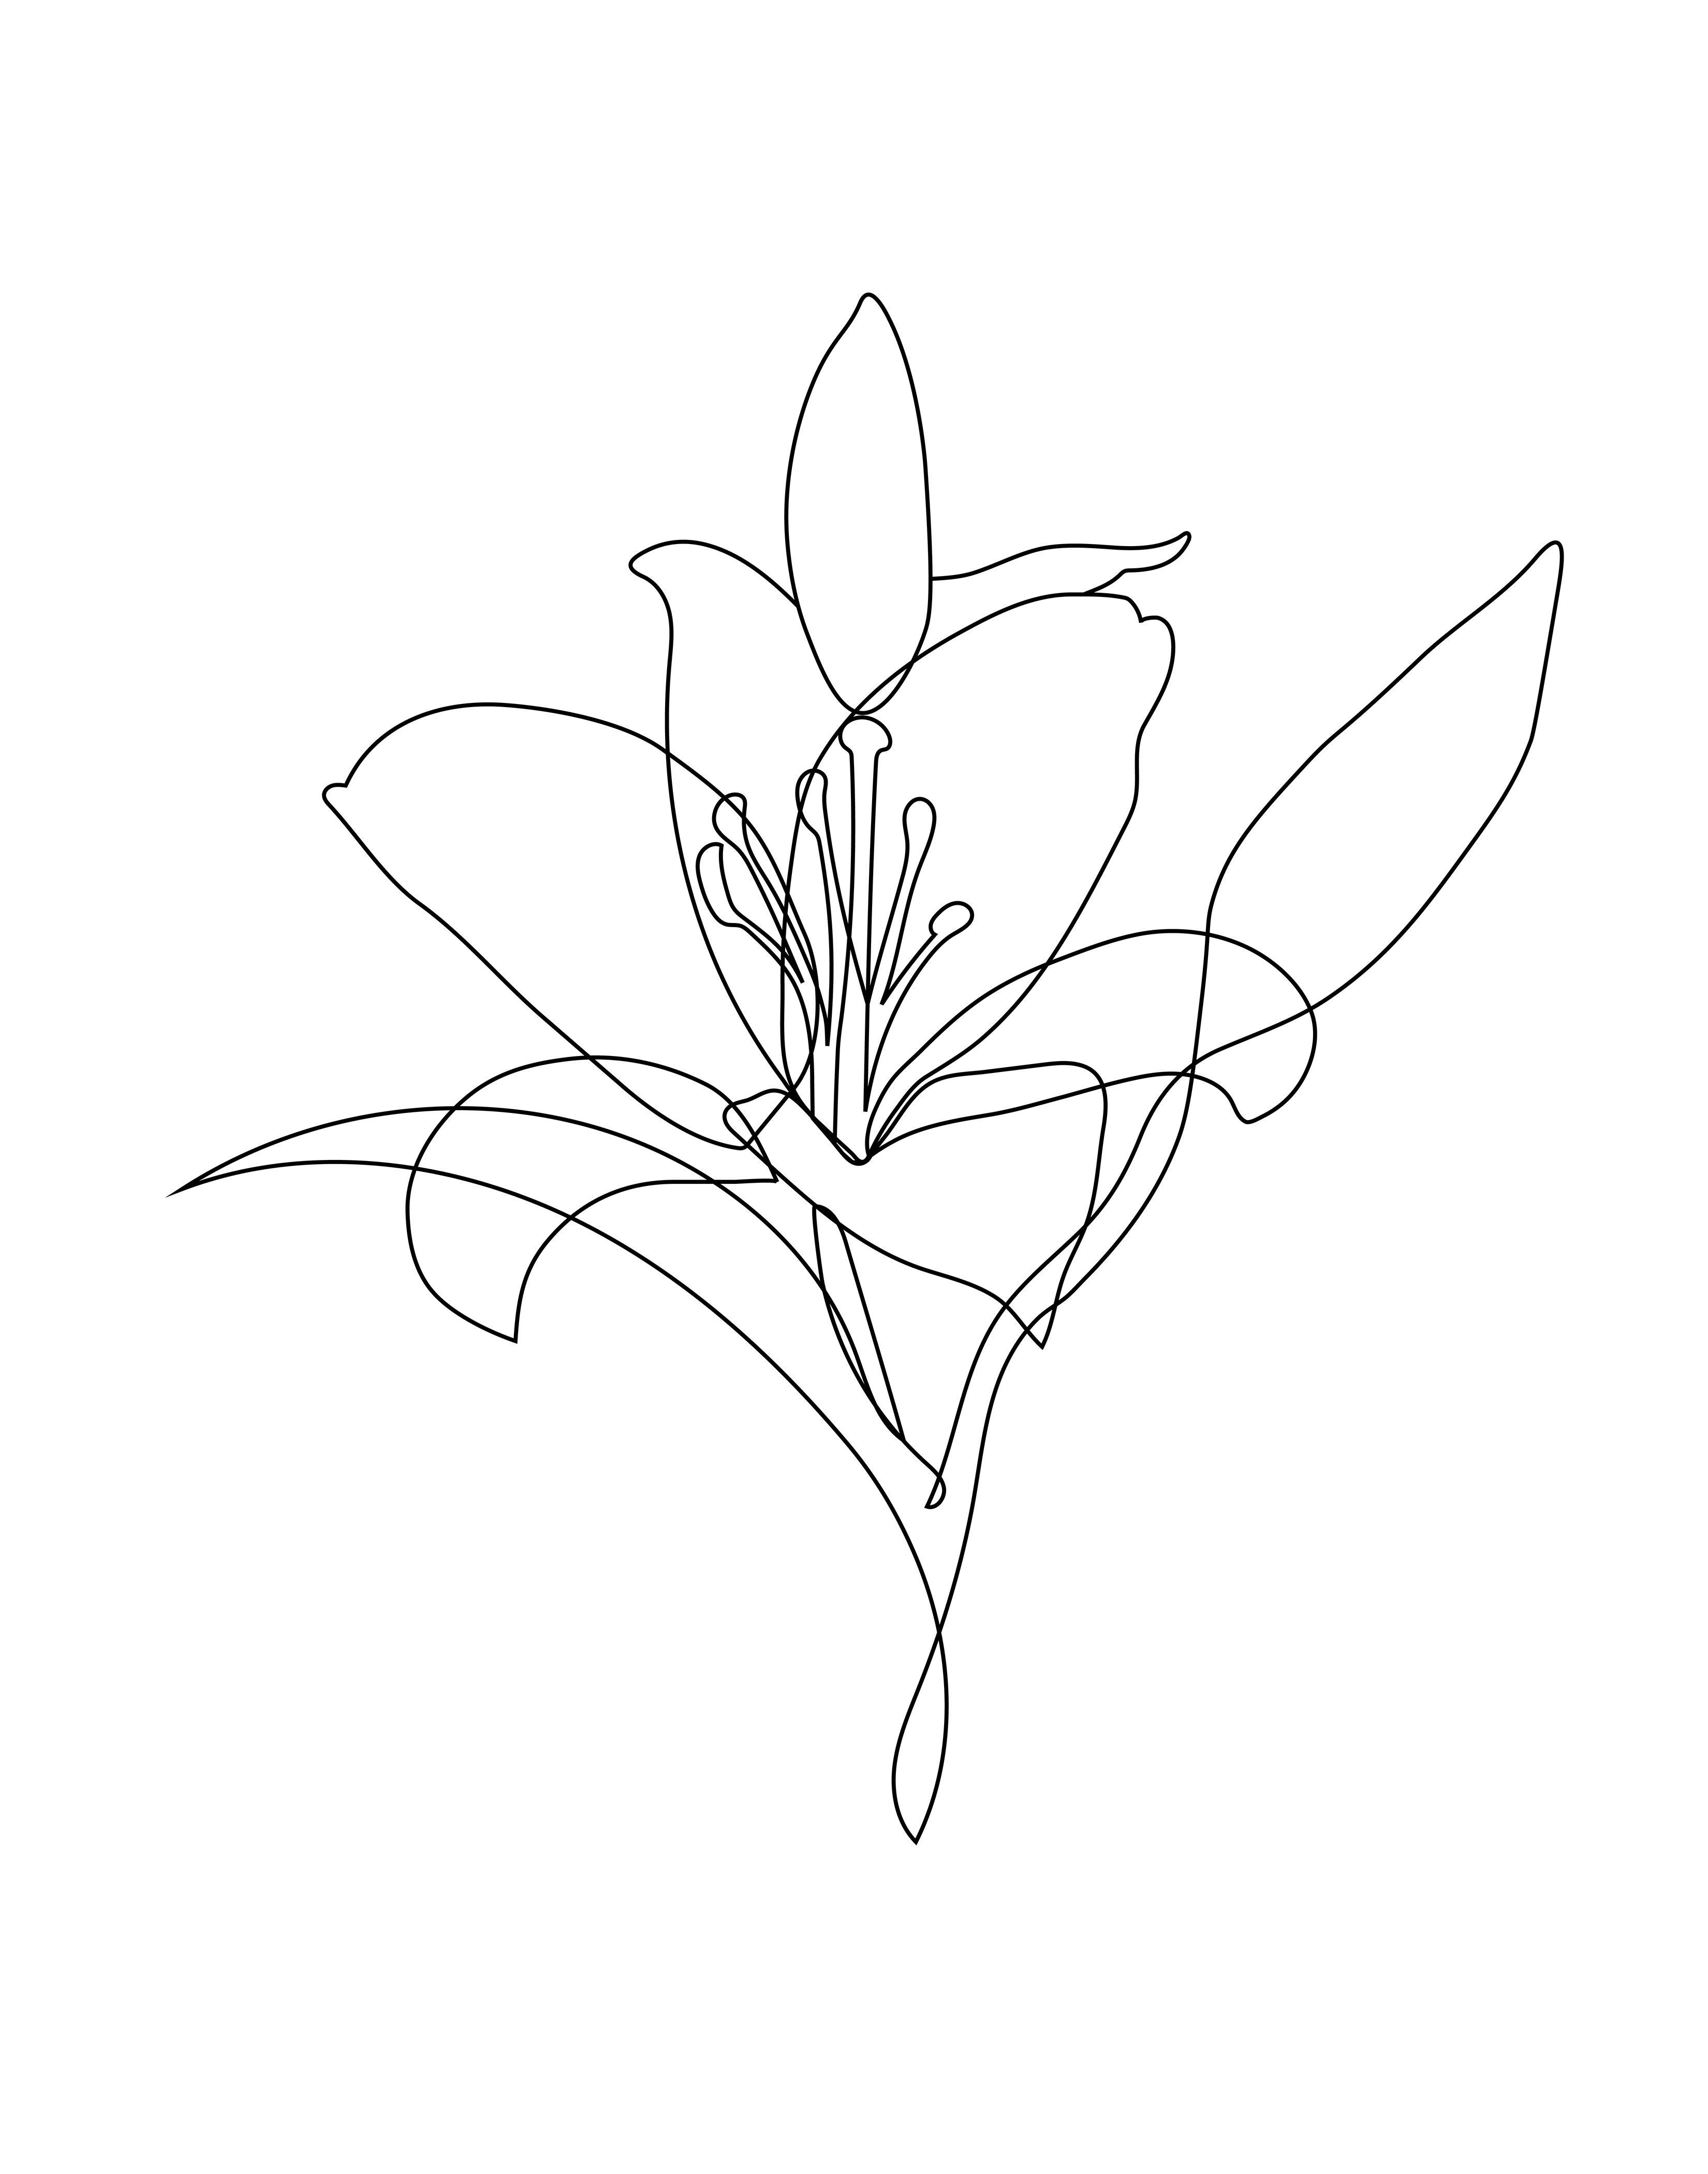 Lily Floral Sketch Clipart Png Digital Design Download Sublimation Graphics Png Continuous Flower Illustration Lalis Arts Line Art Tattoos Line Art Flowers Flower Line Drawings